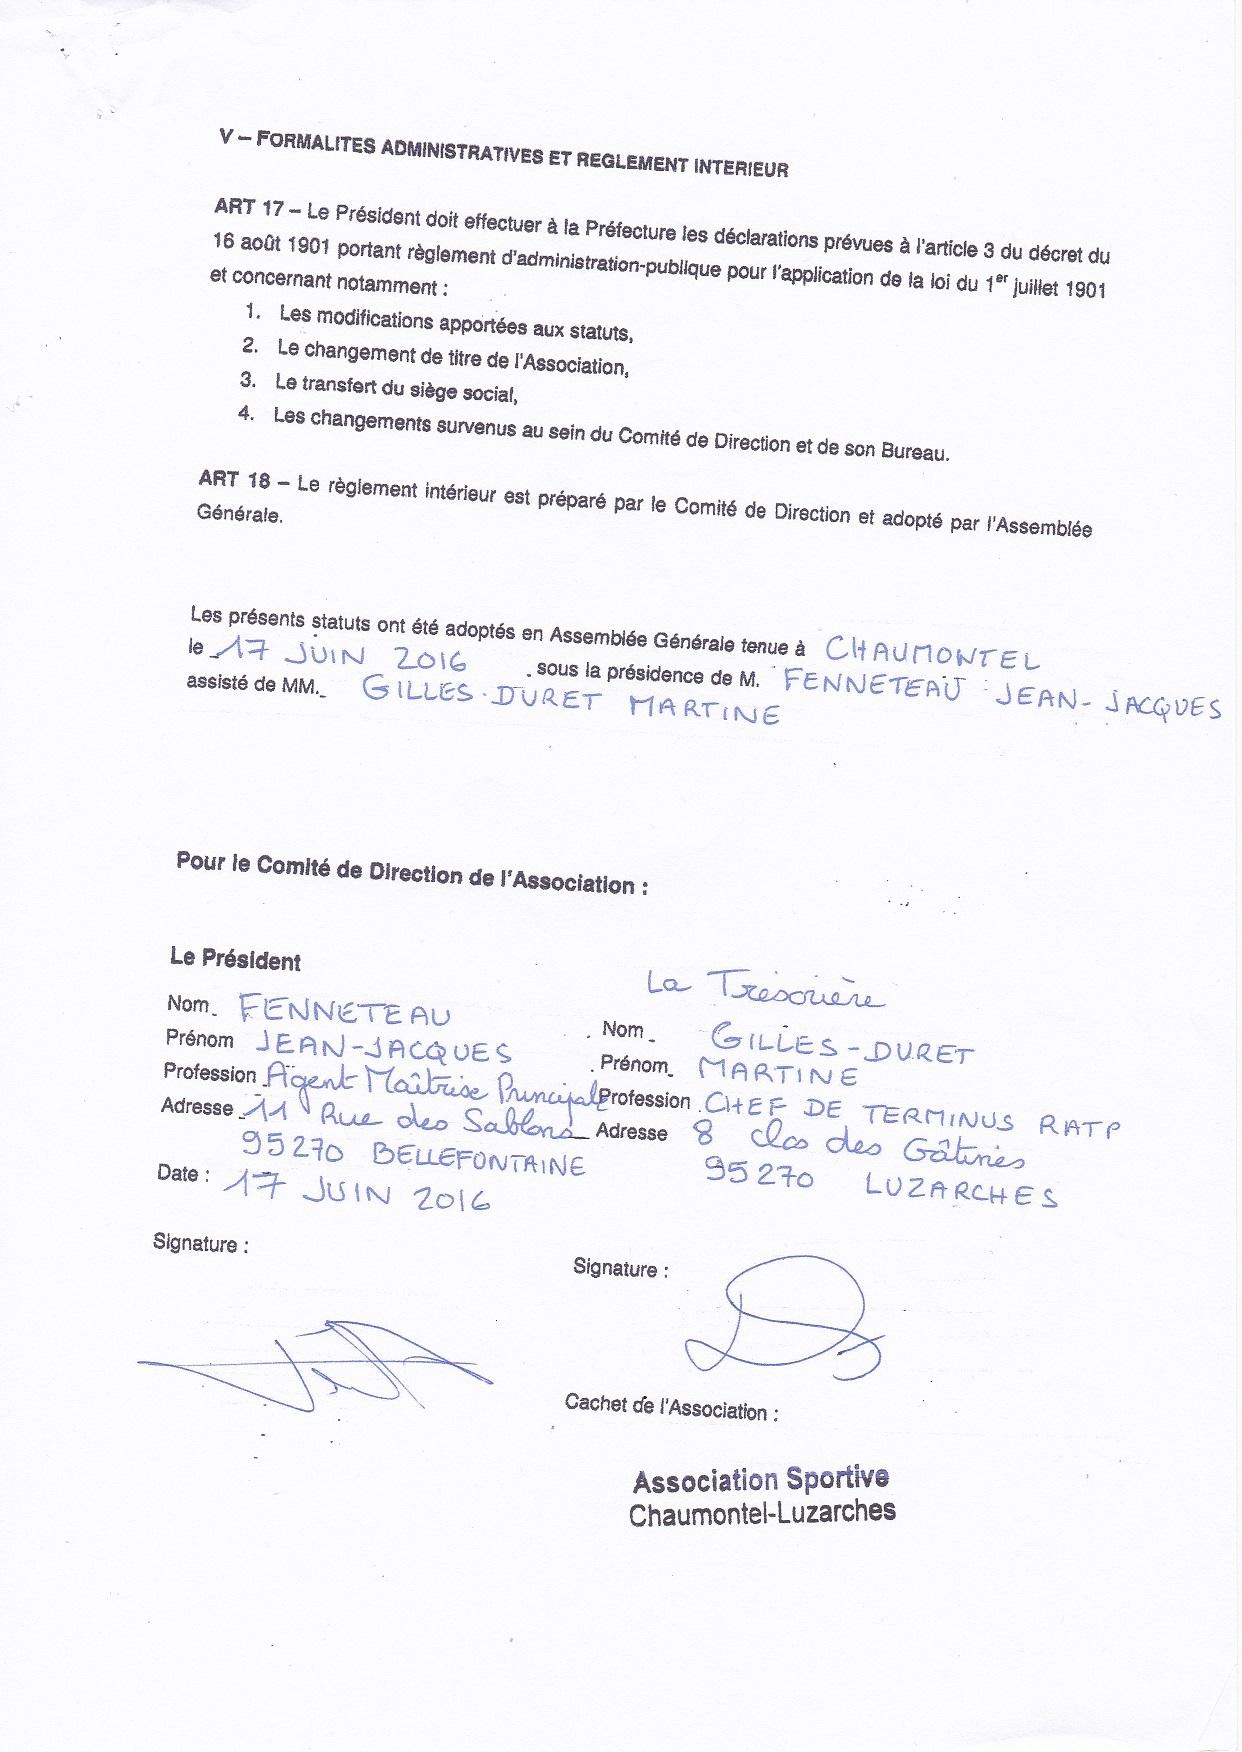 R glement int rieur club football association sportive for Reglement interieur association sportive